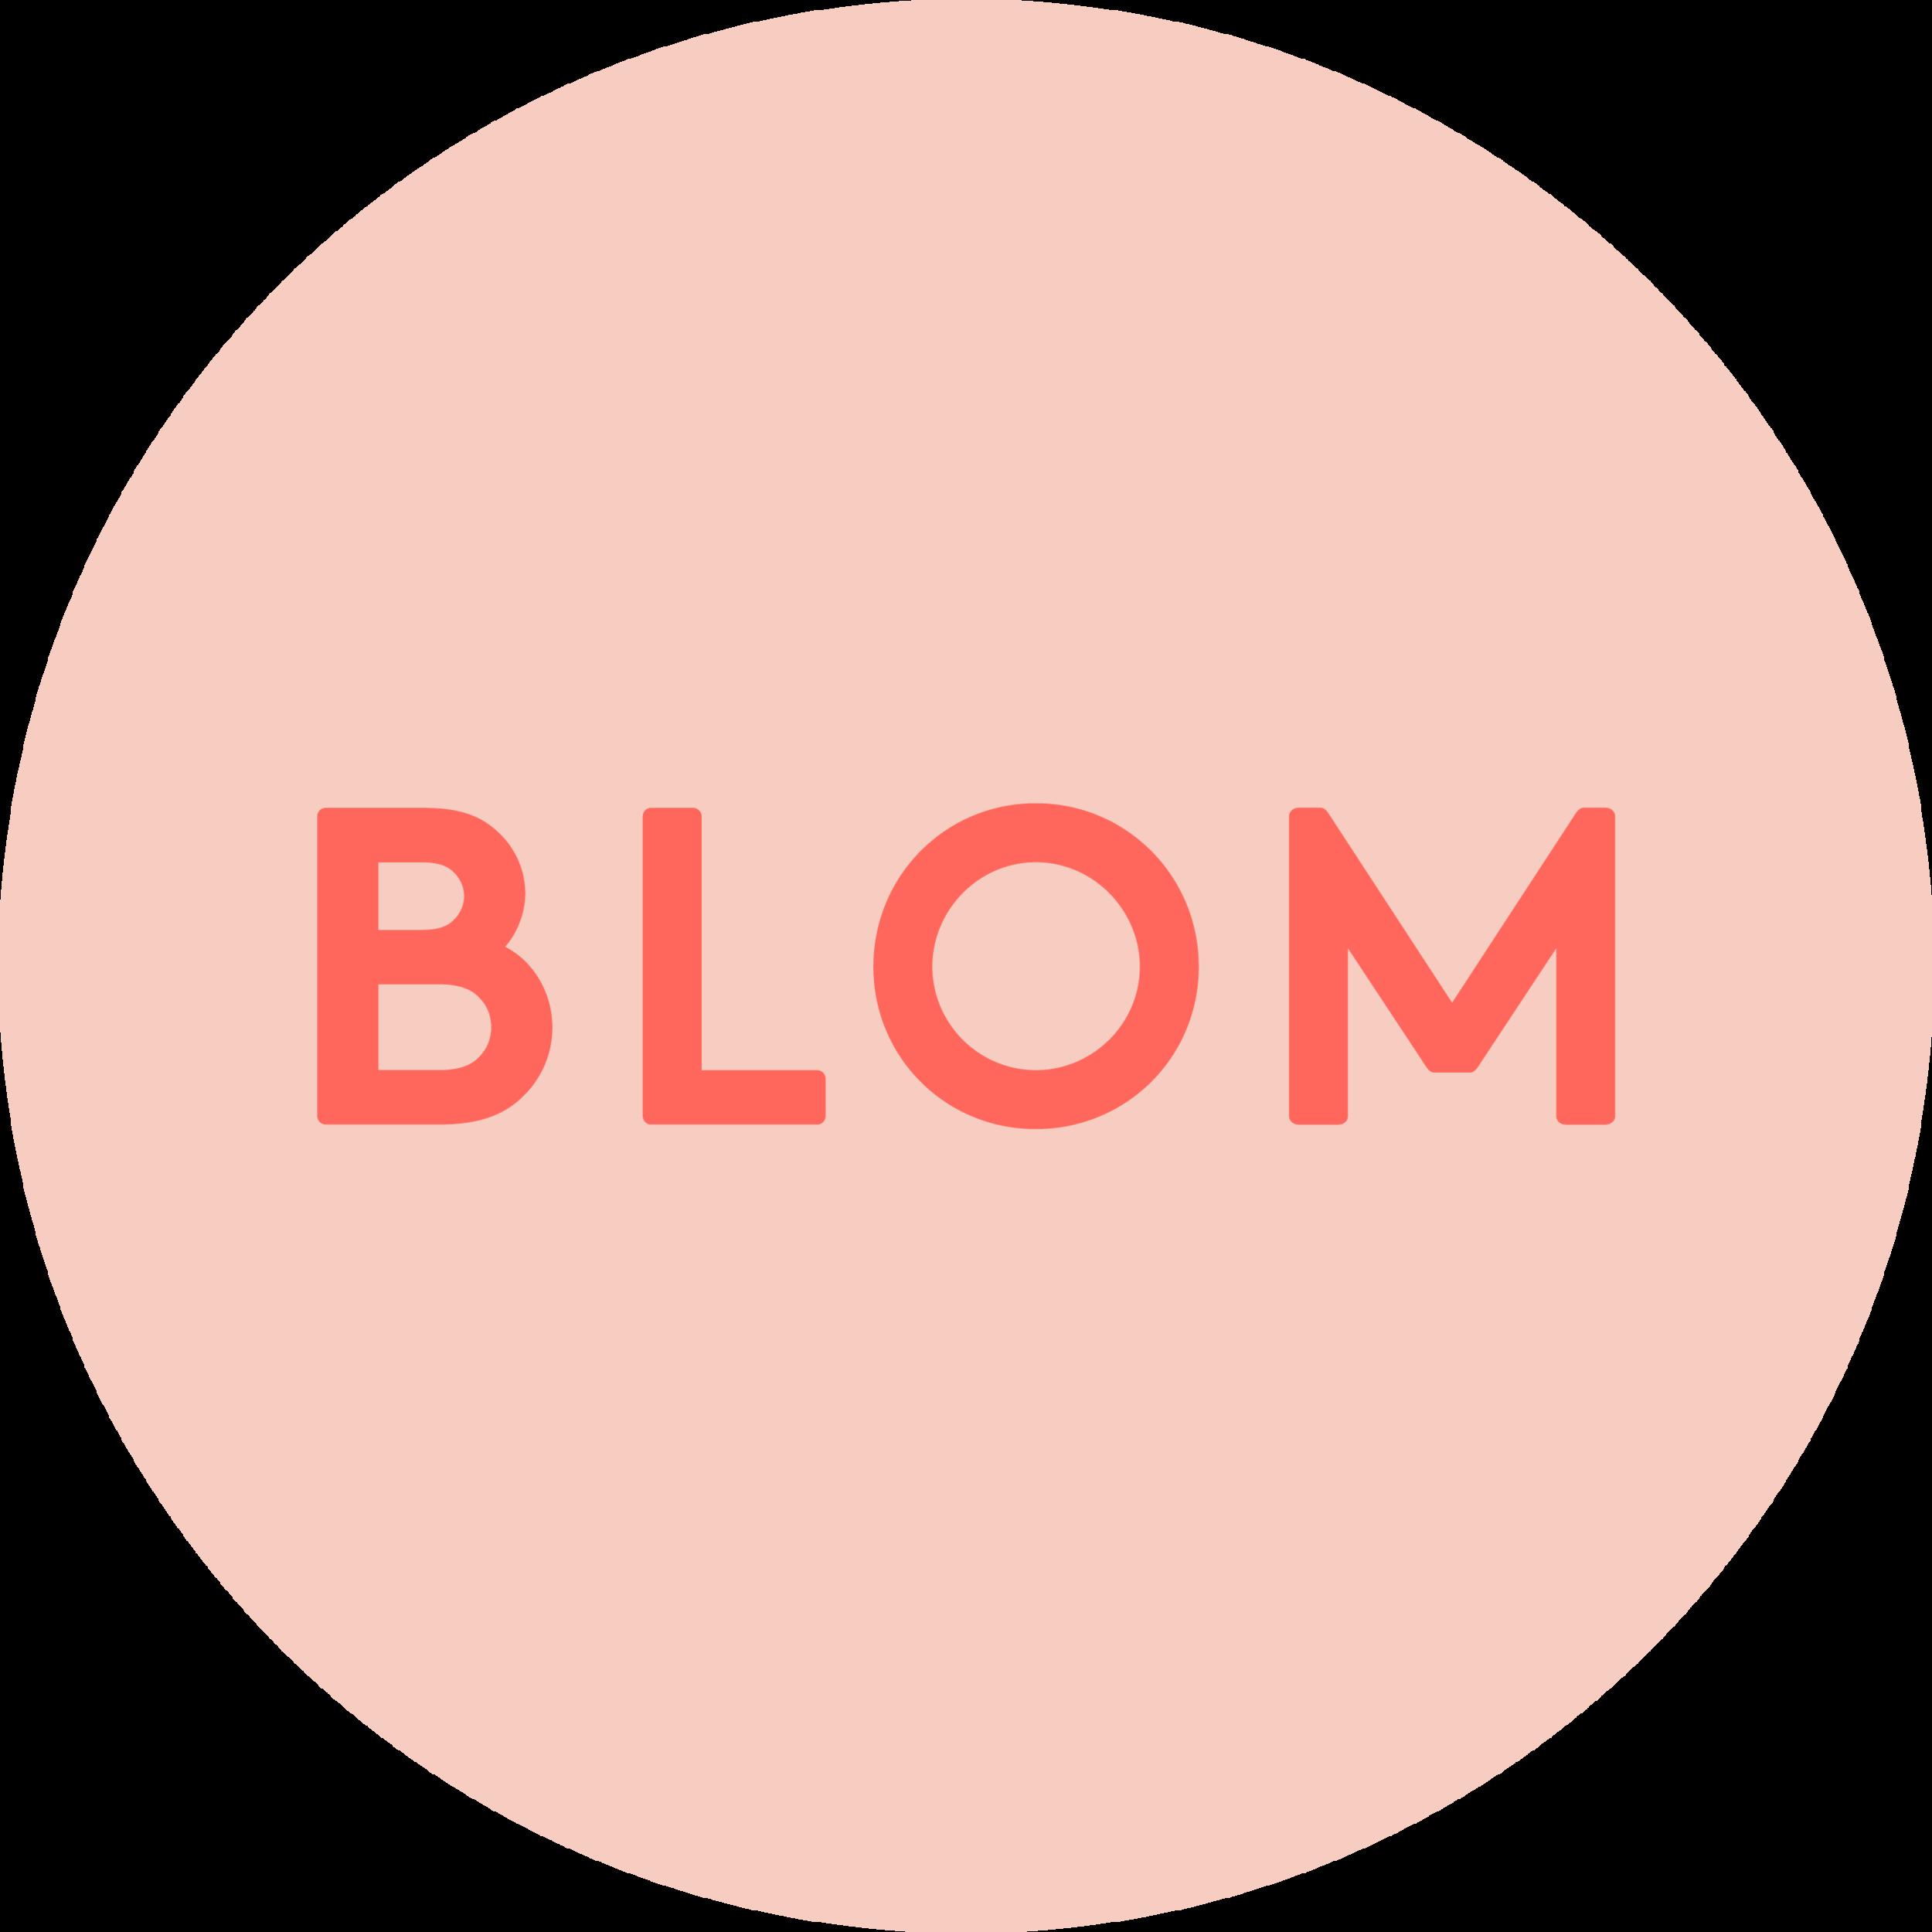 blom logo